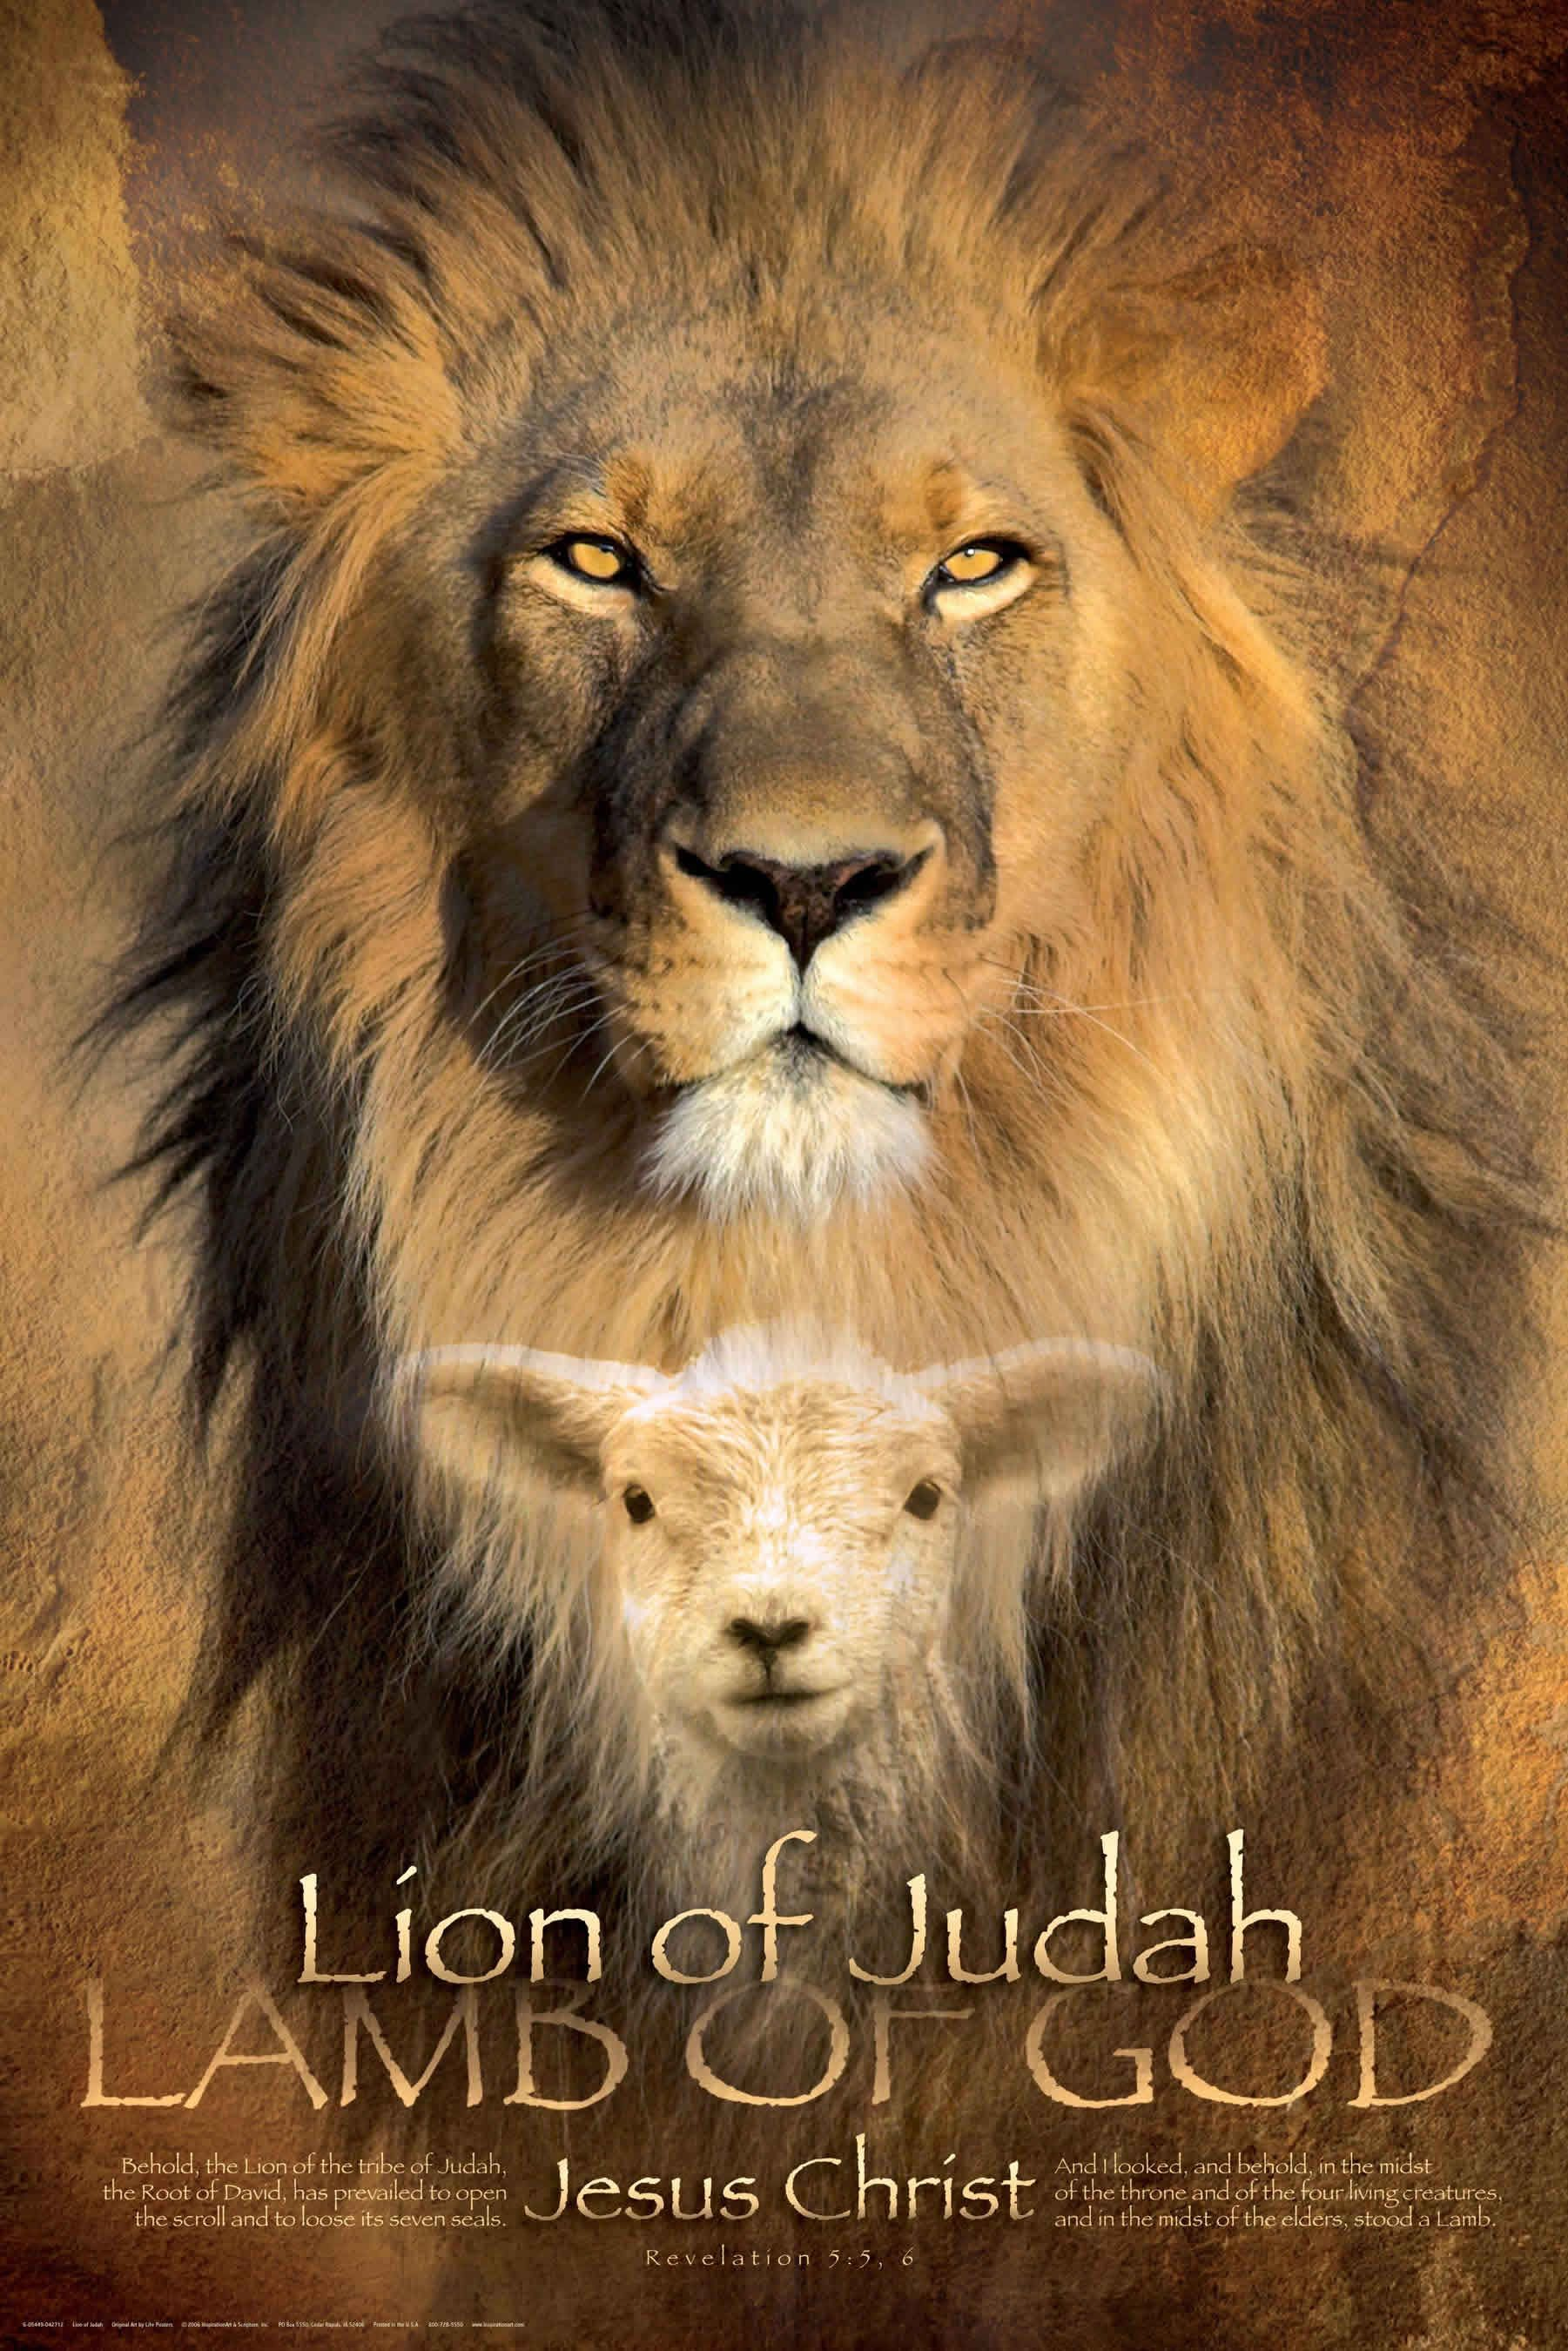 http://inspirationart.com/images/enlarged/lion_of_judah.jpg